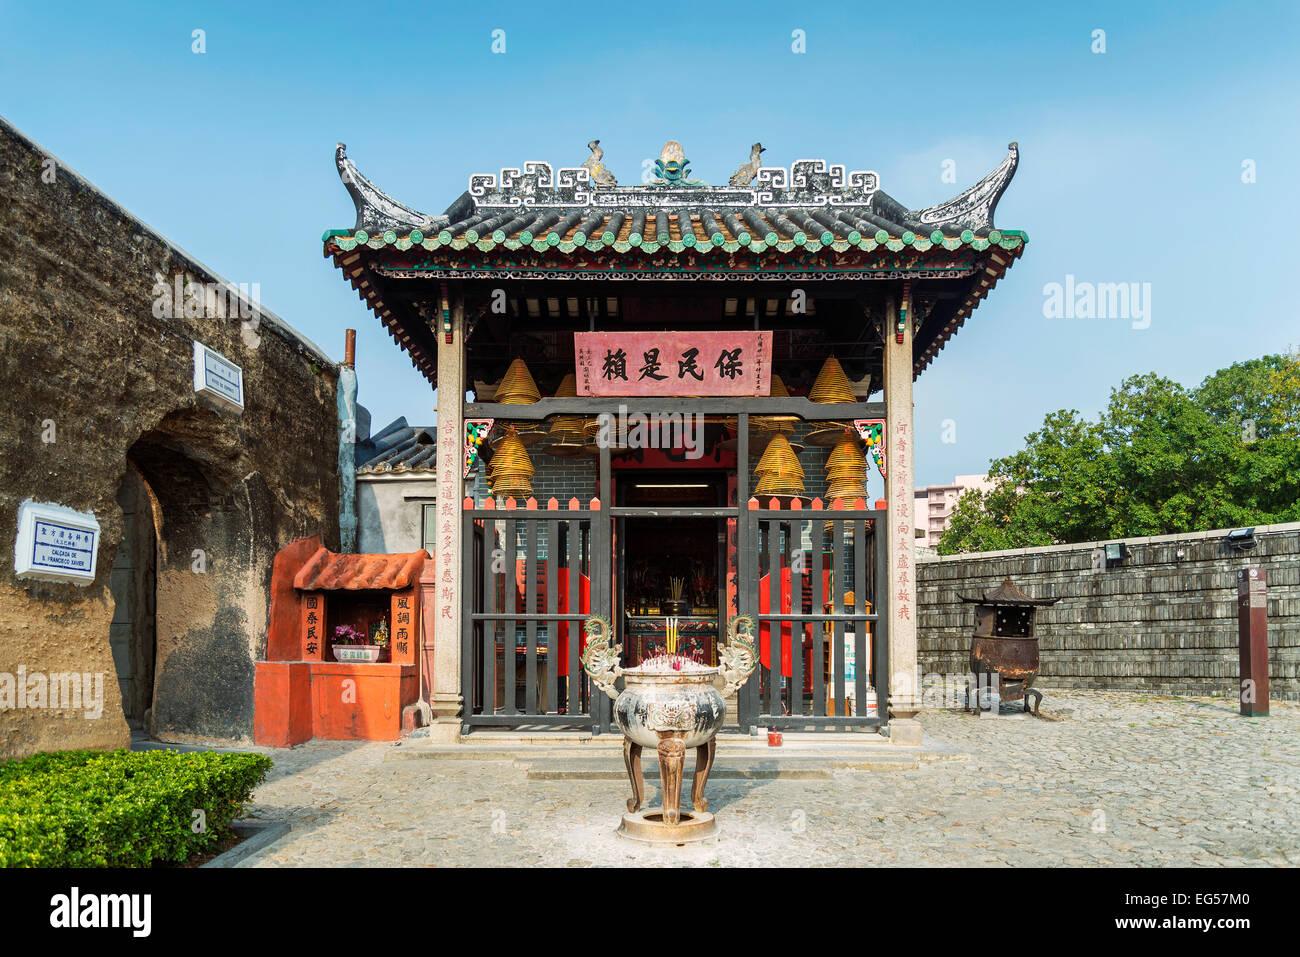 Templo chino junto a ruinas de San Pablo, en Macao, China. Imagen De Stock